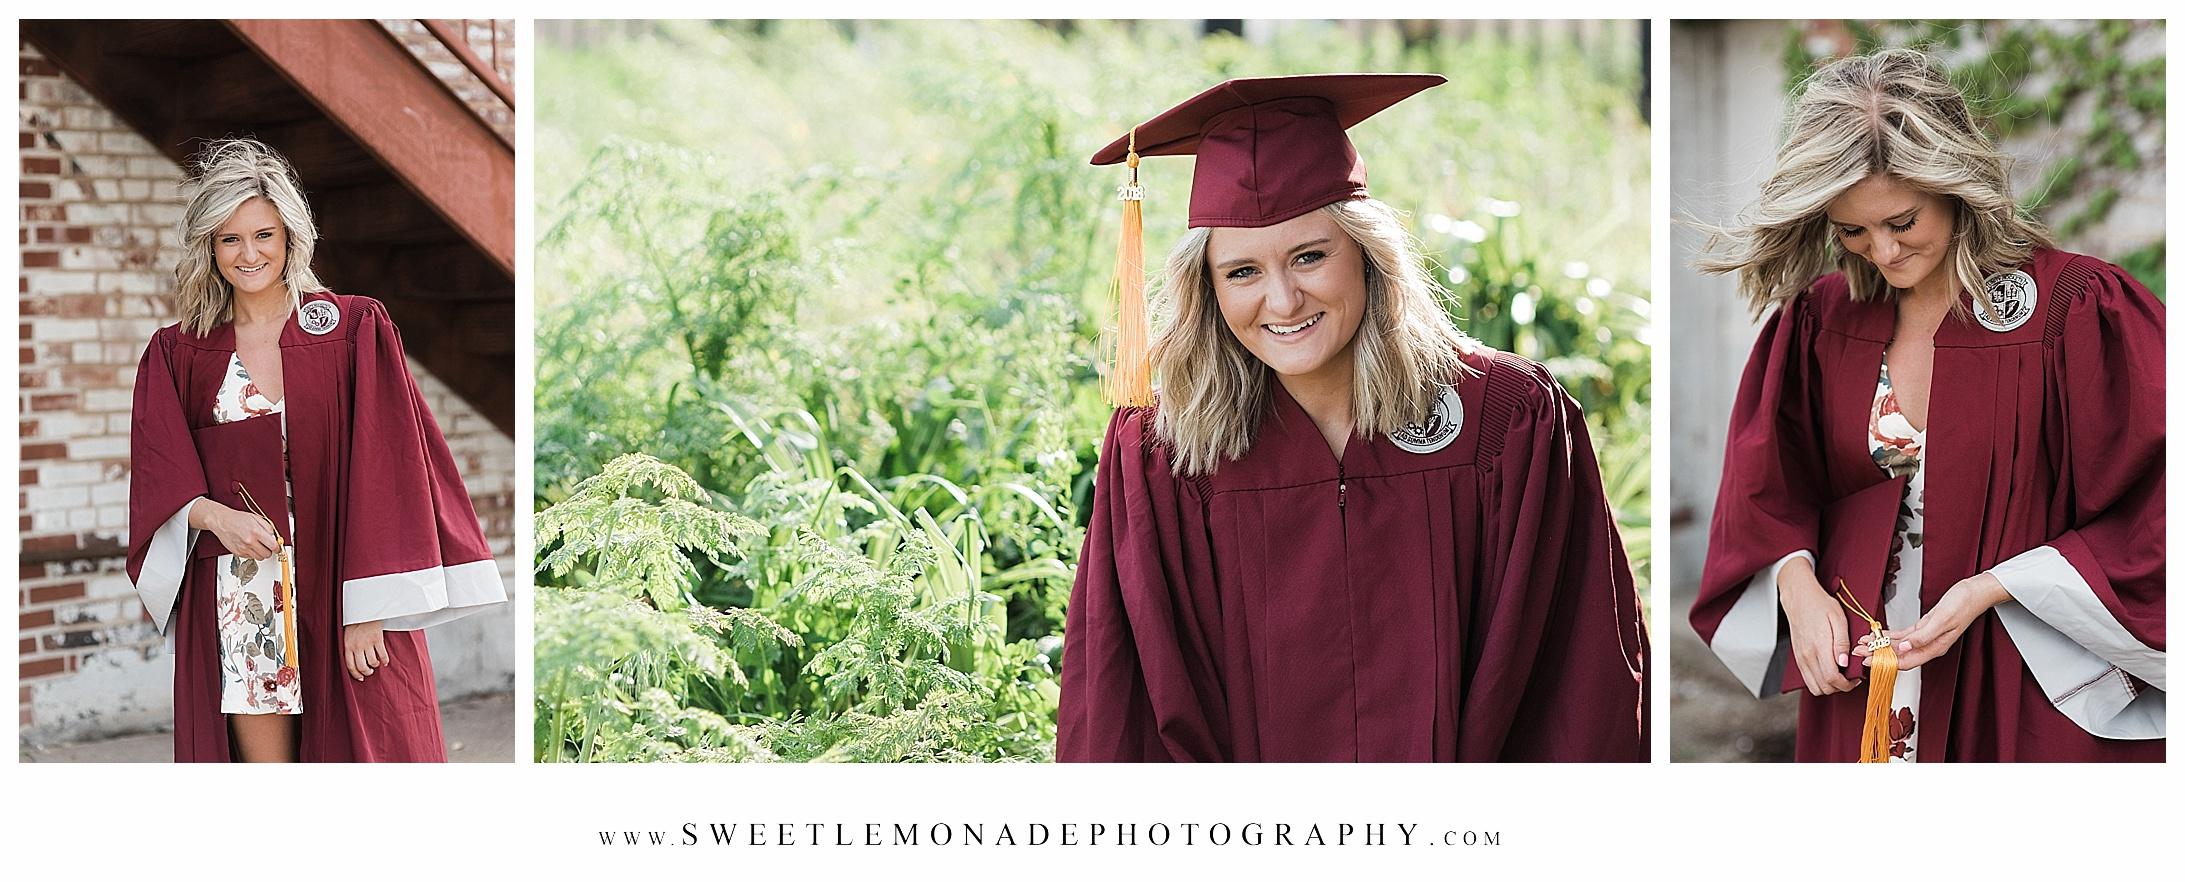 champaign-illinois-unity-rockets-high-school-graduation-tolono-senior-photographer-sweet-lemonade-photography_2070.jpg